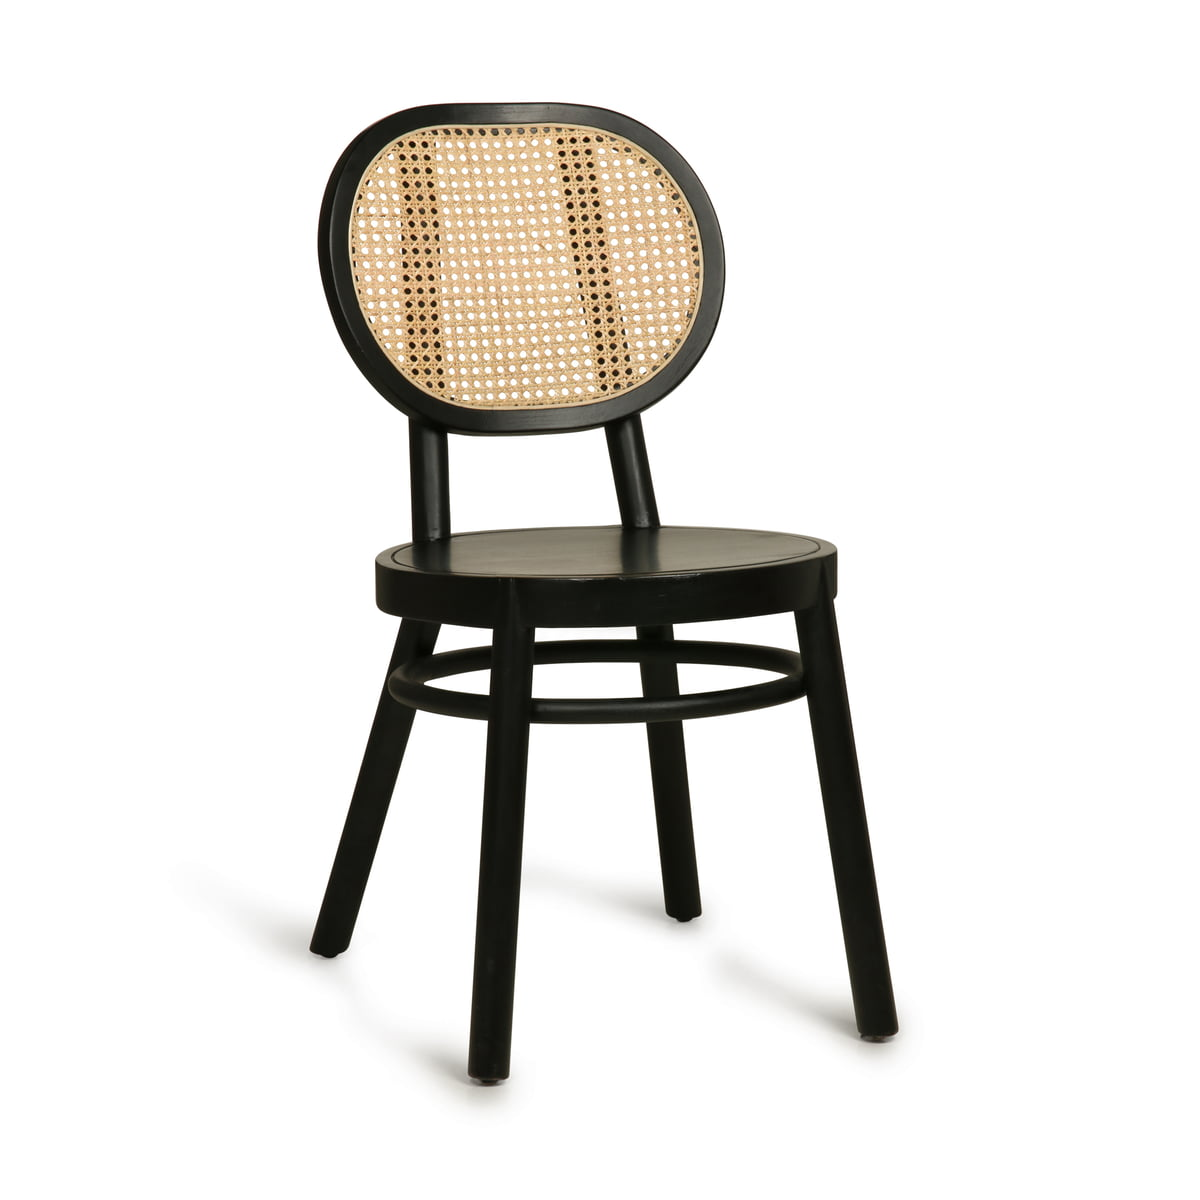 HKliving - Retro Webbing Stuhl mit Geflecht, schwarz